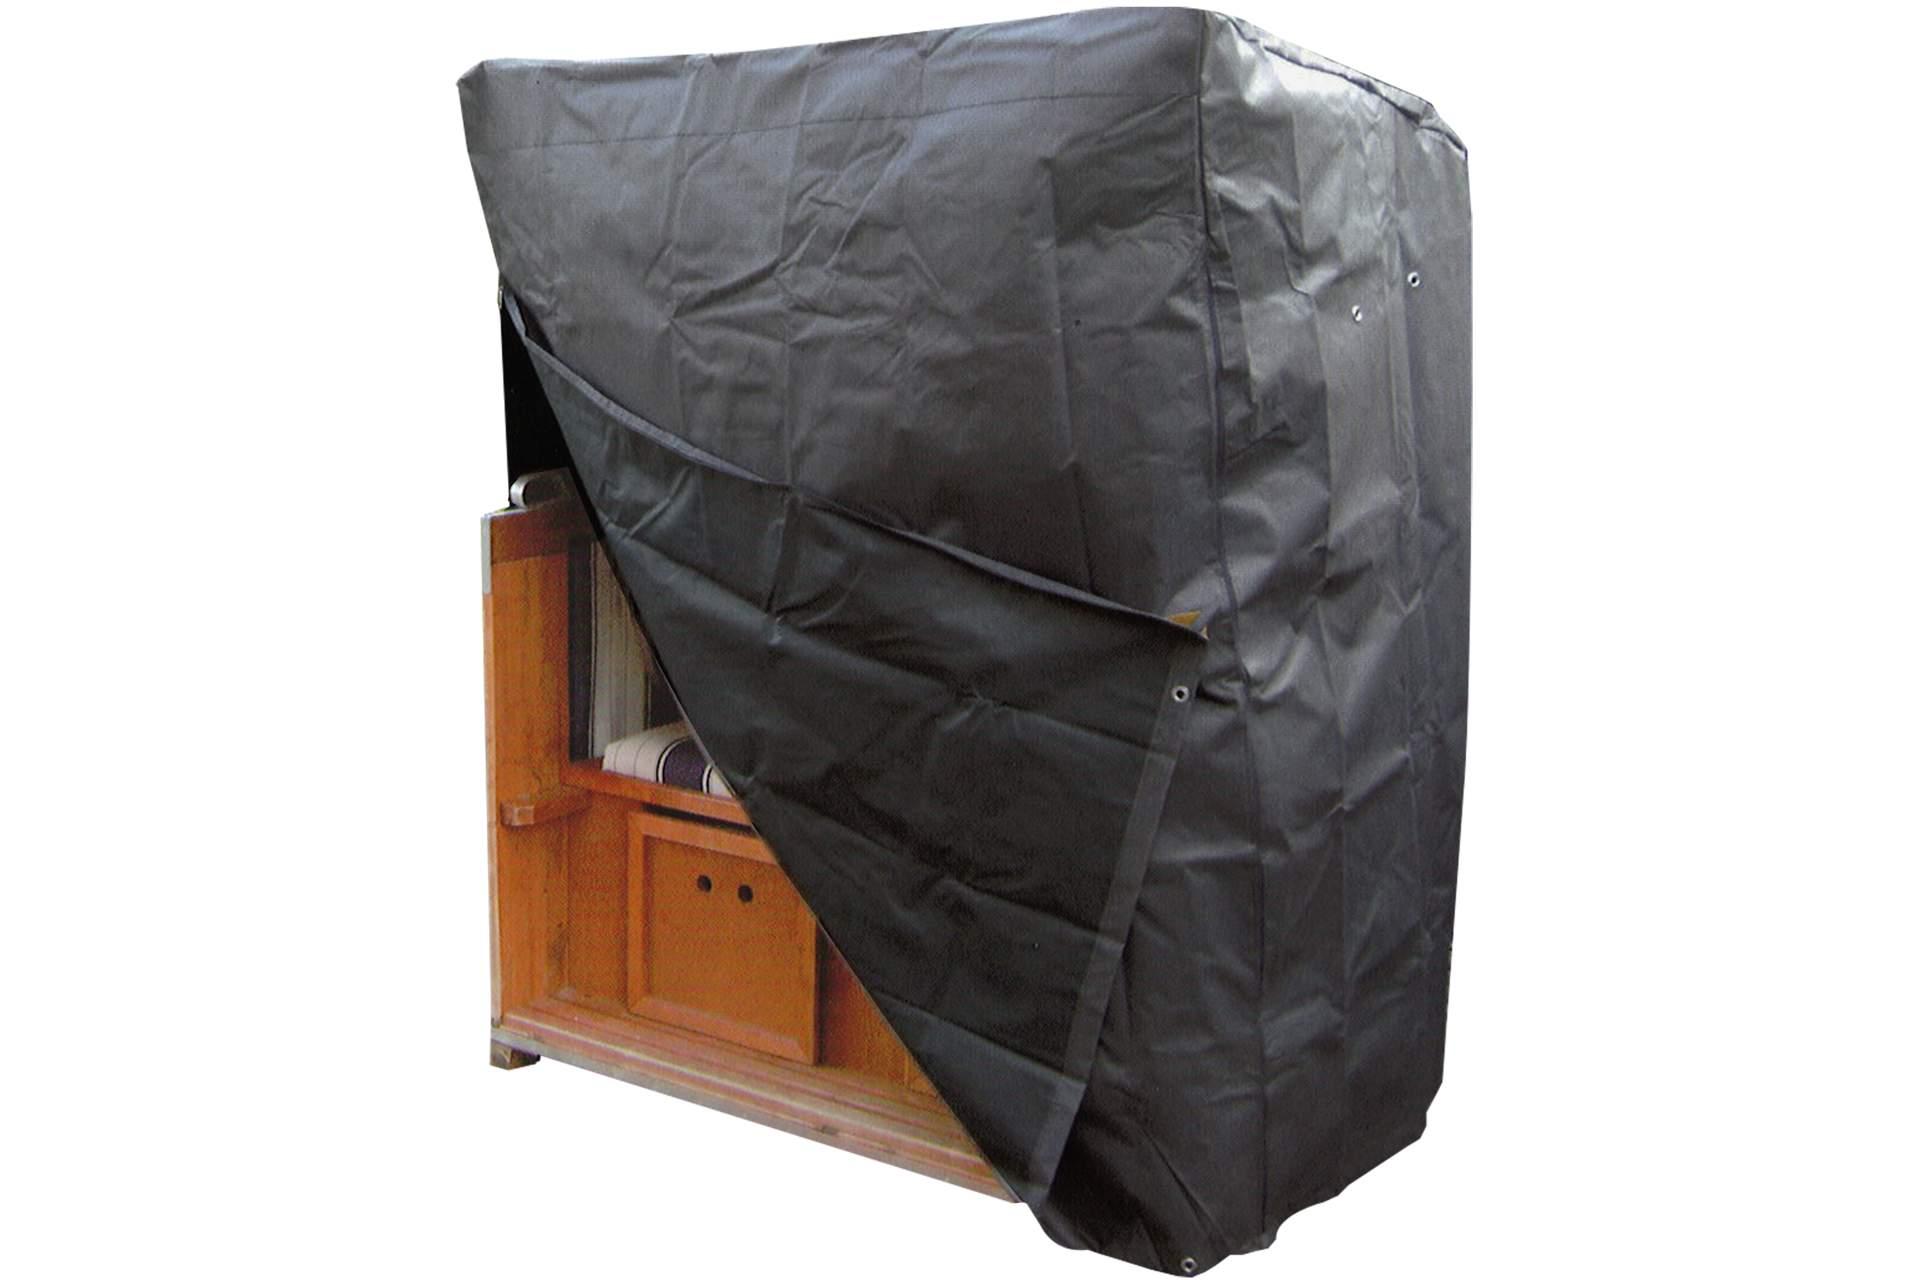 schutzh lle f r strandkorb kynast h lle schutz haube 155cm. Black Bedroom Furniture Sets. Home Design Ideas